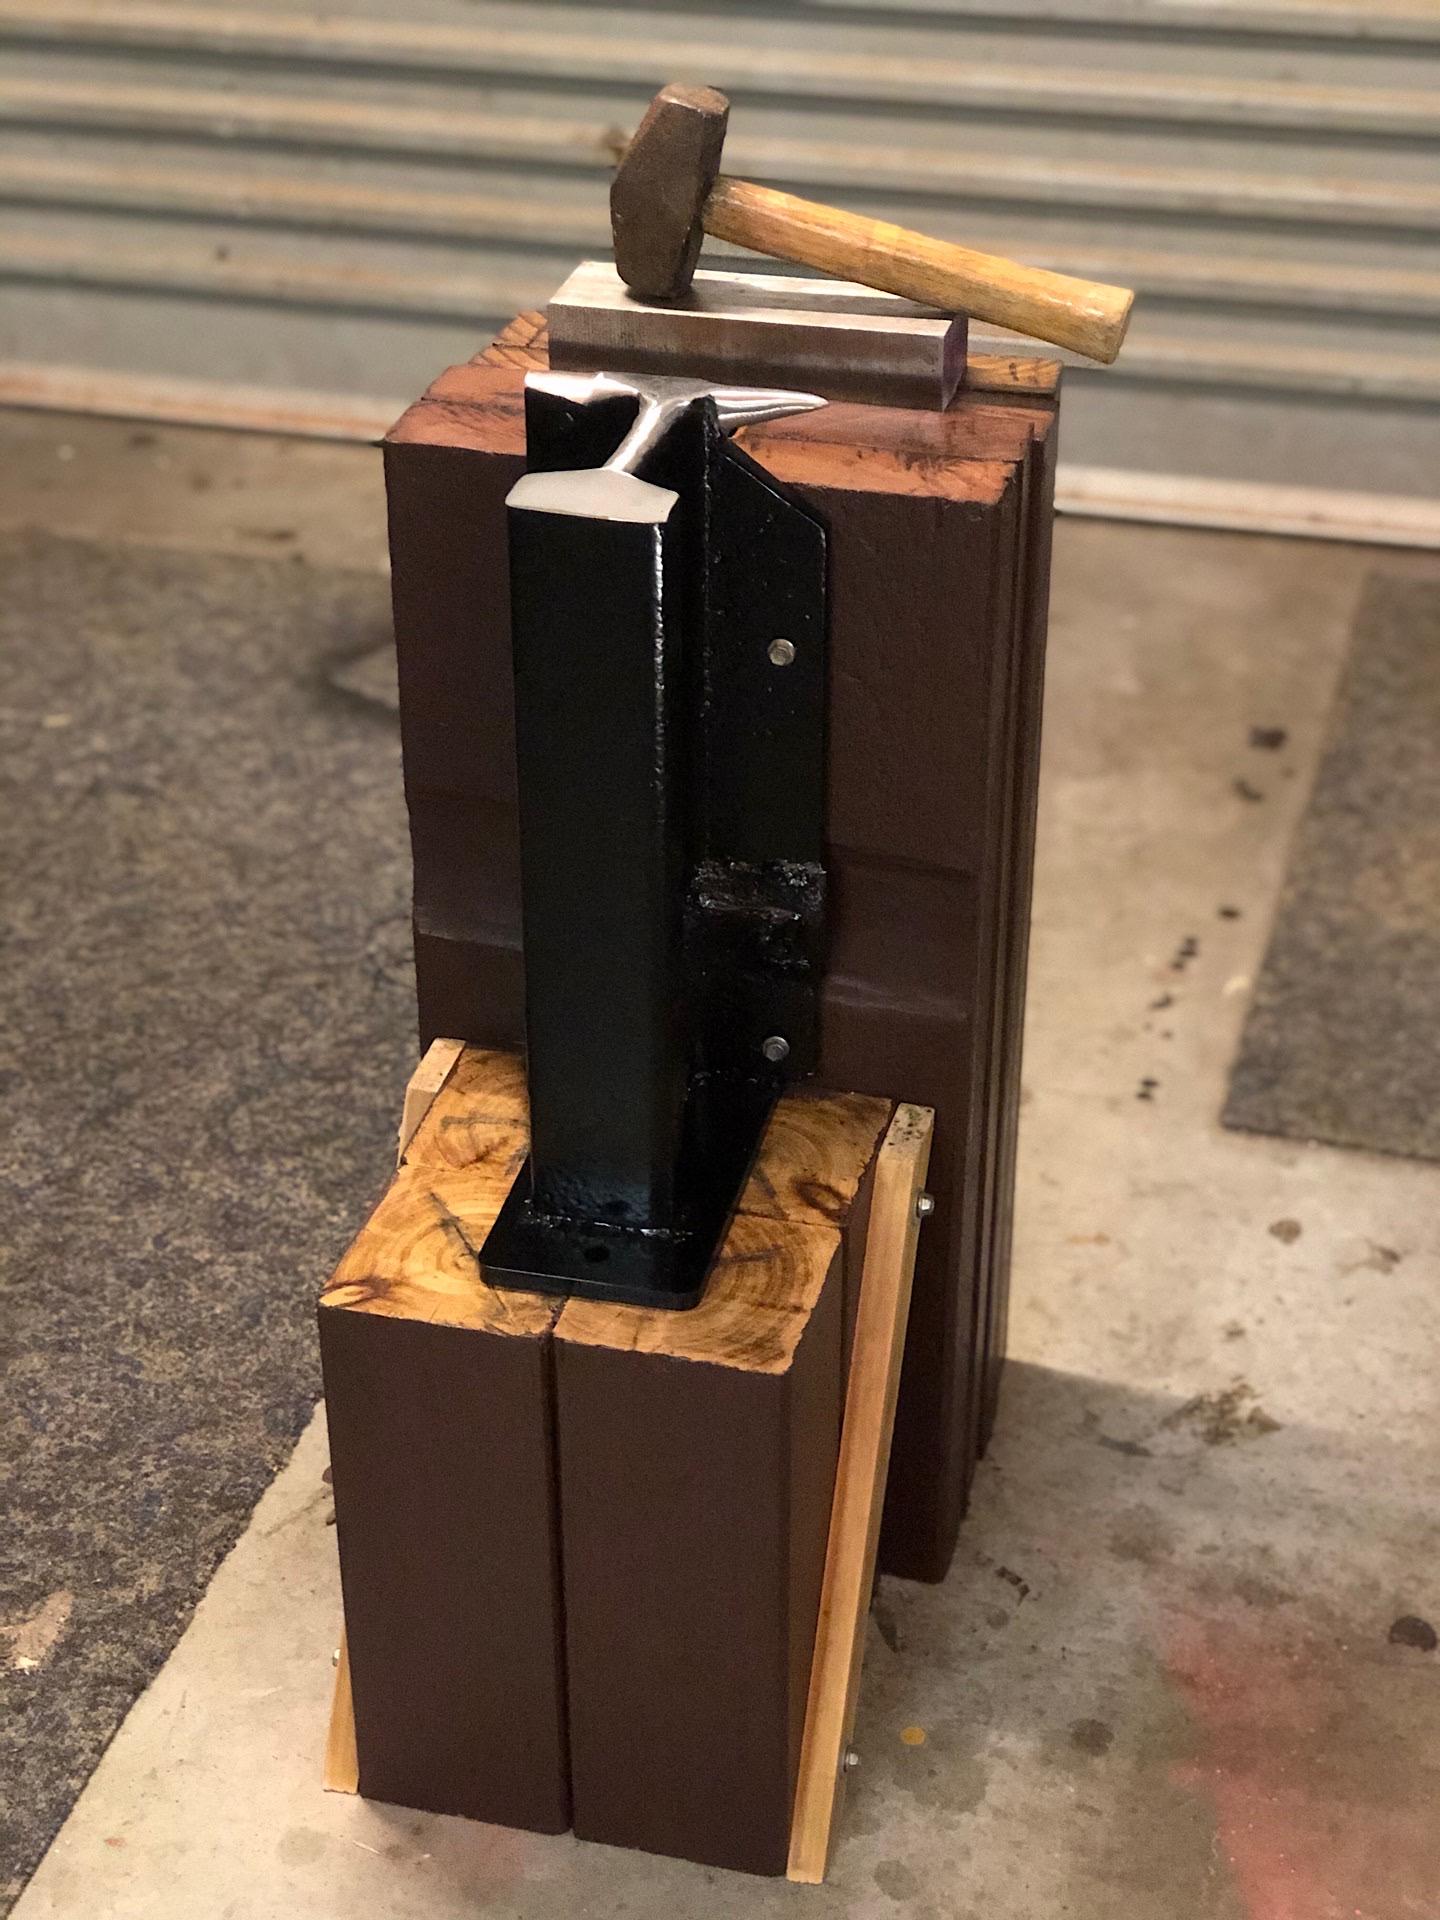 My homemade crane rail anvil